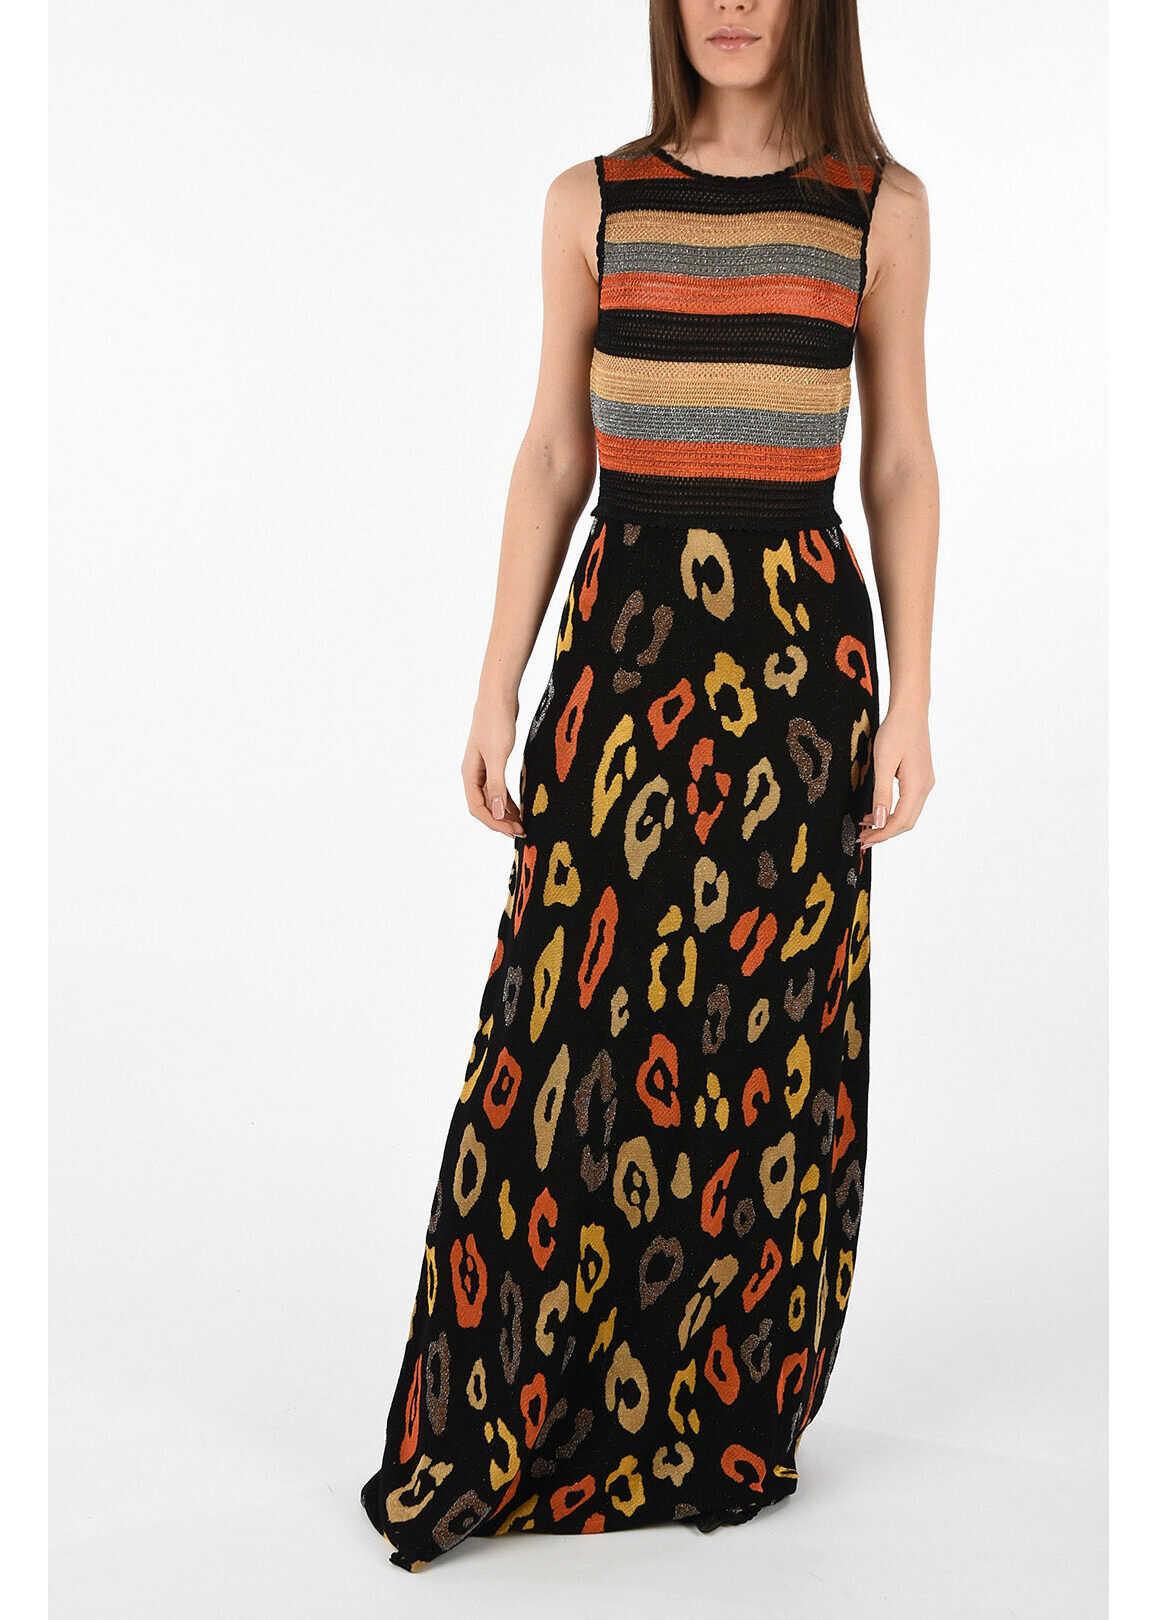 Just Cavalli Glittered Knit Dress MULTICOLOR